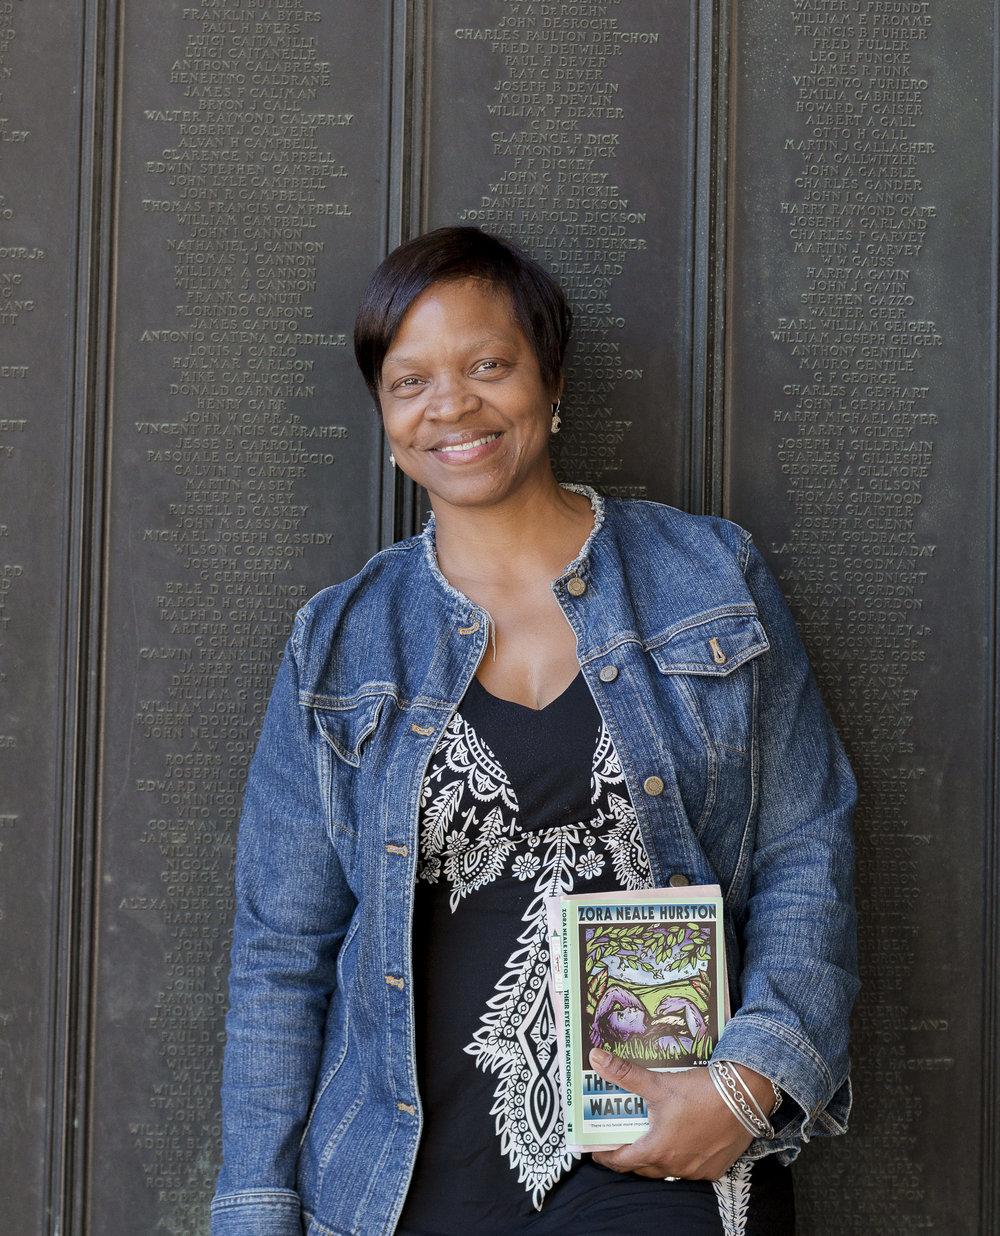 Michelle Weaver  Program Manager OF SITE-BASED ENGAGEMENT